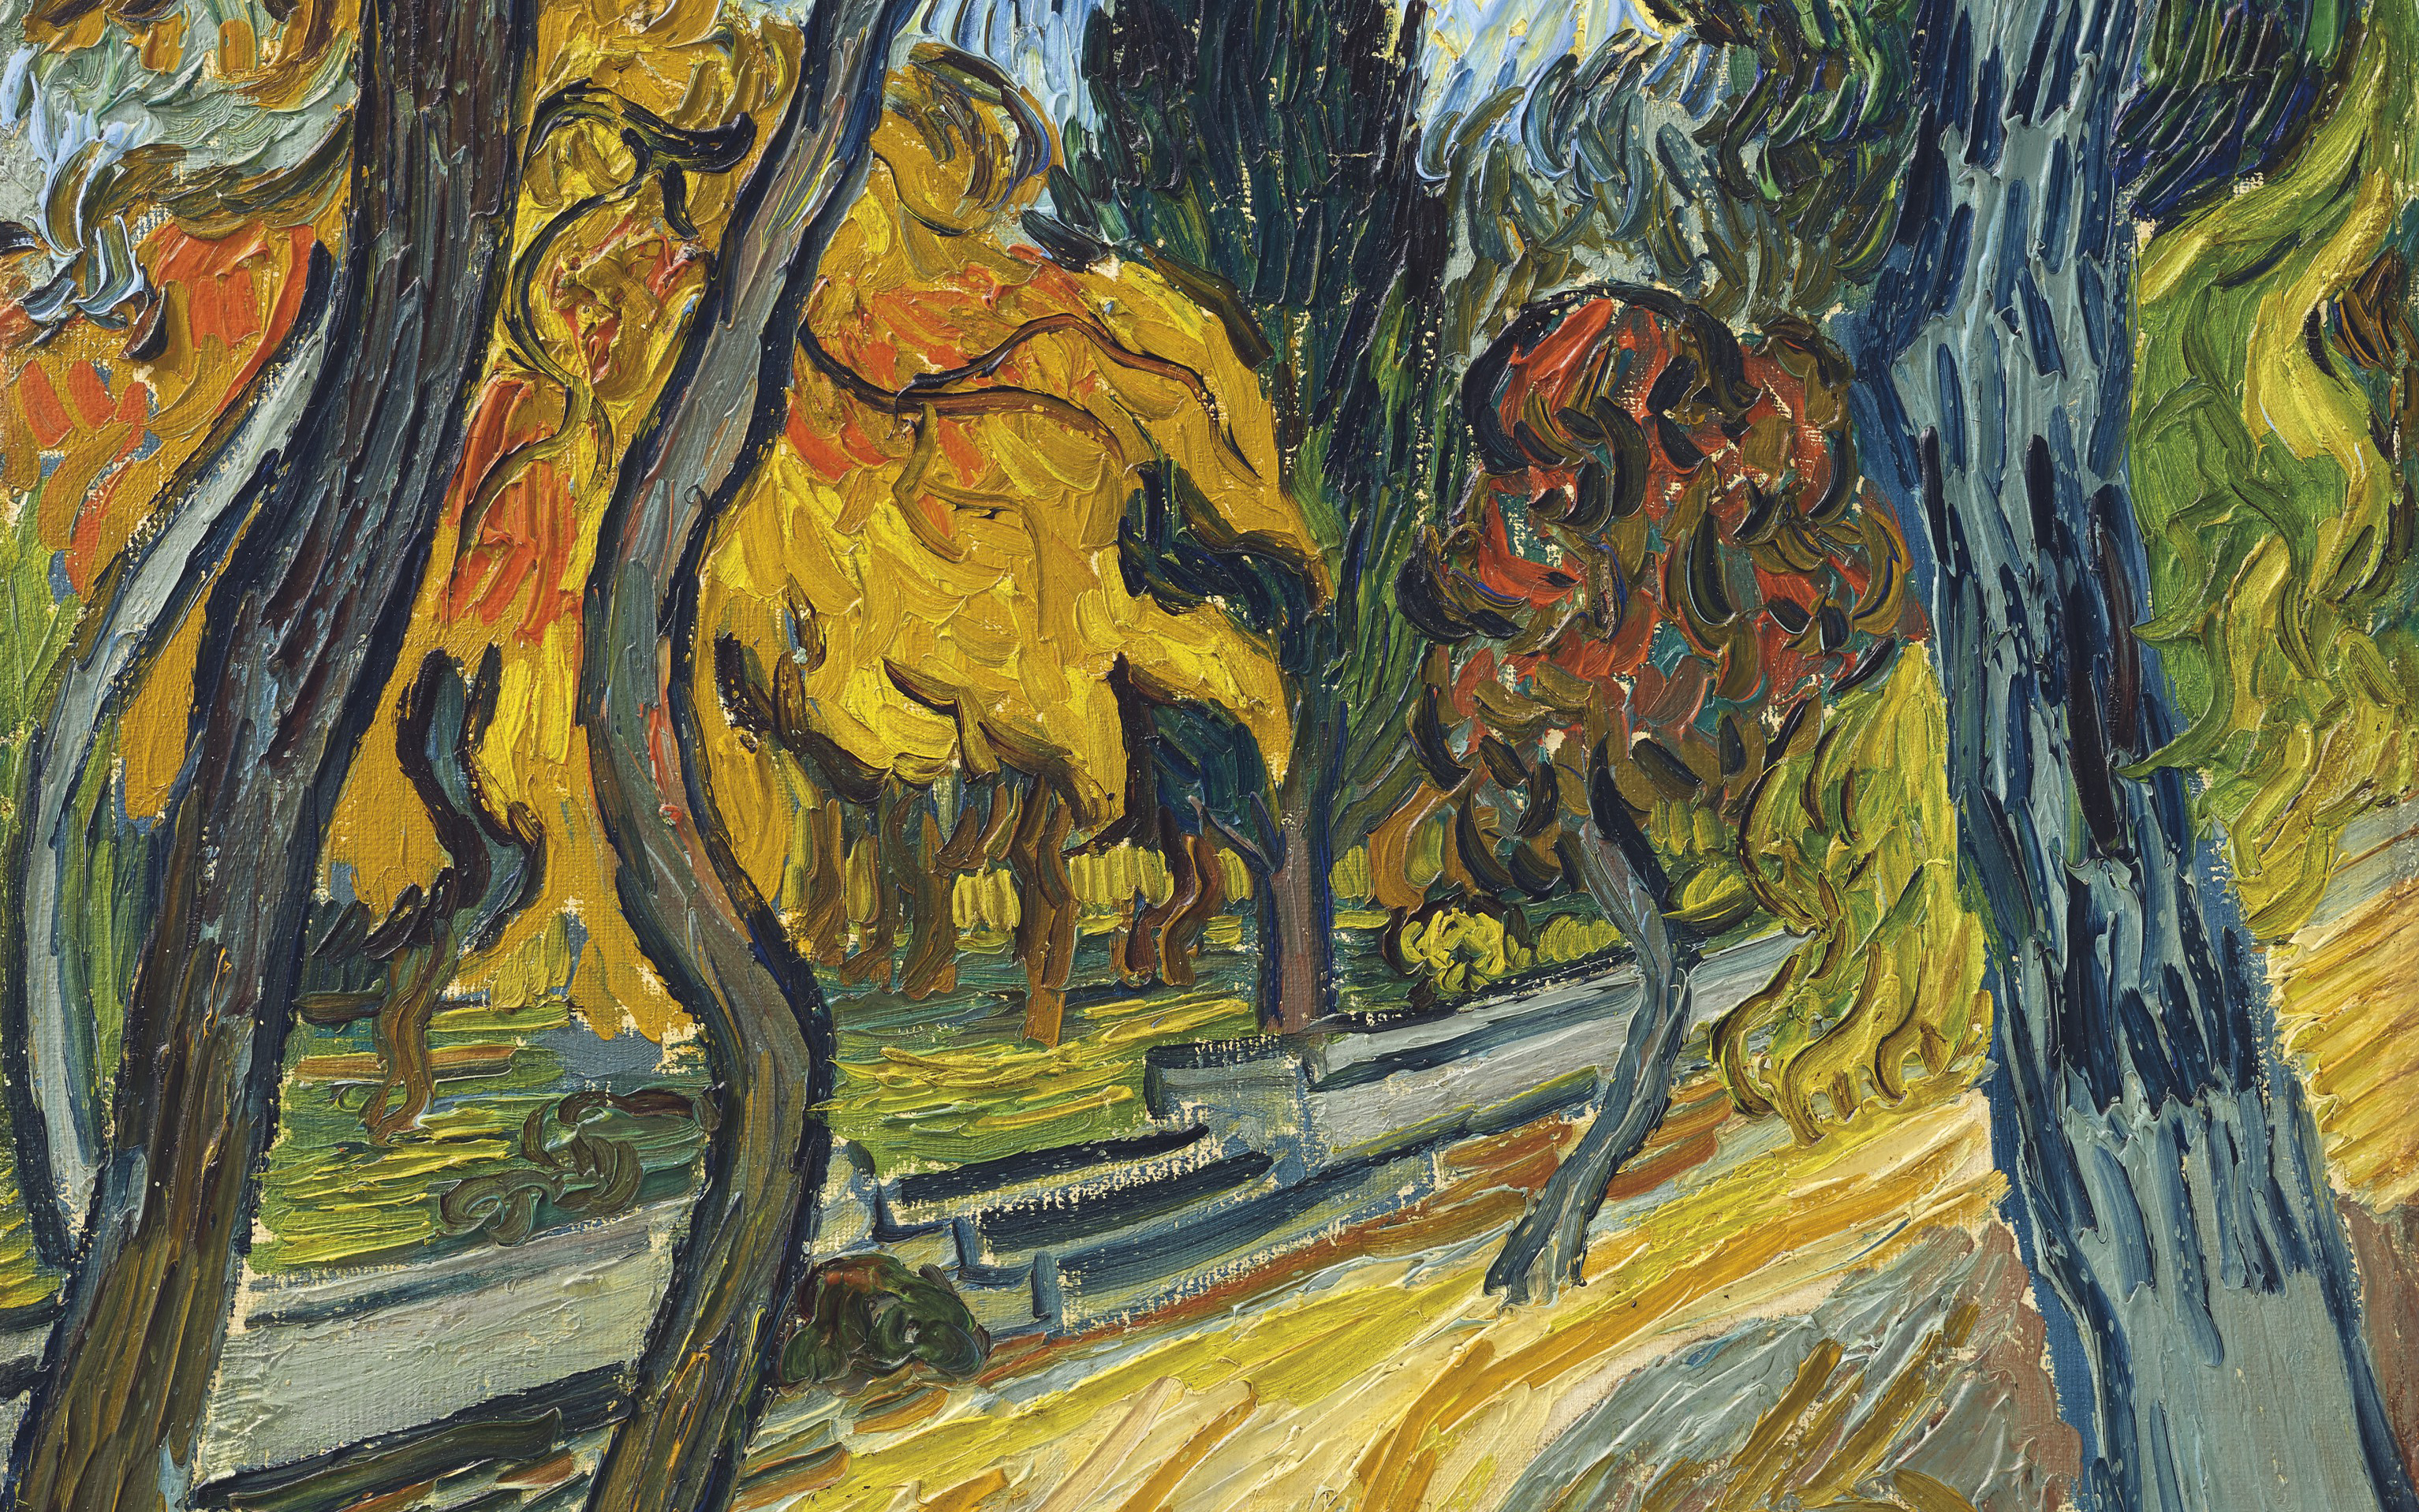 gardner's art through the ages